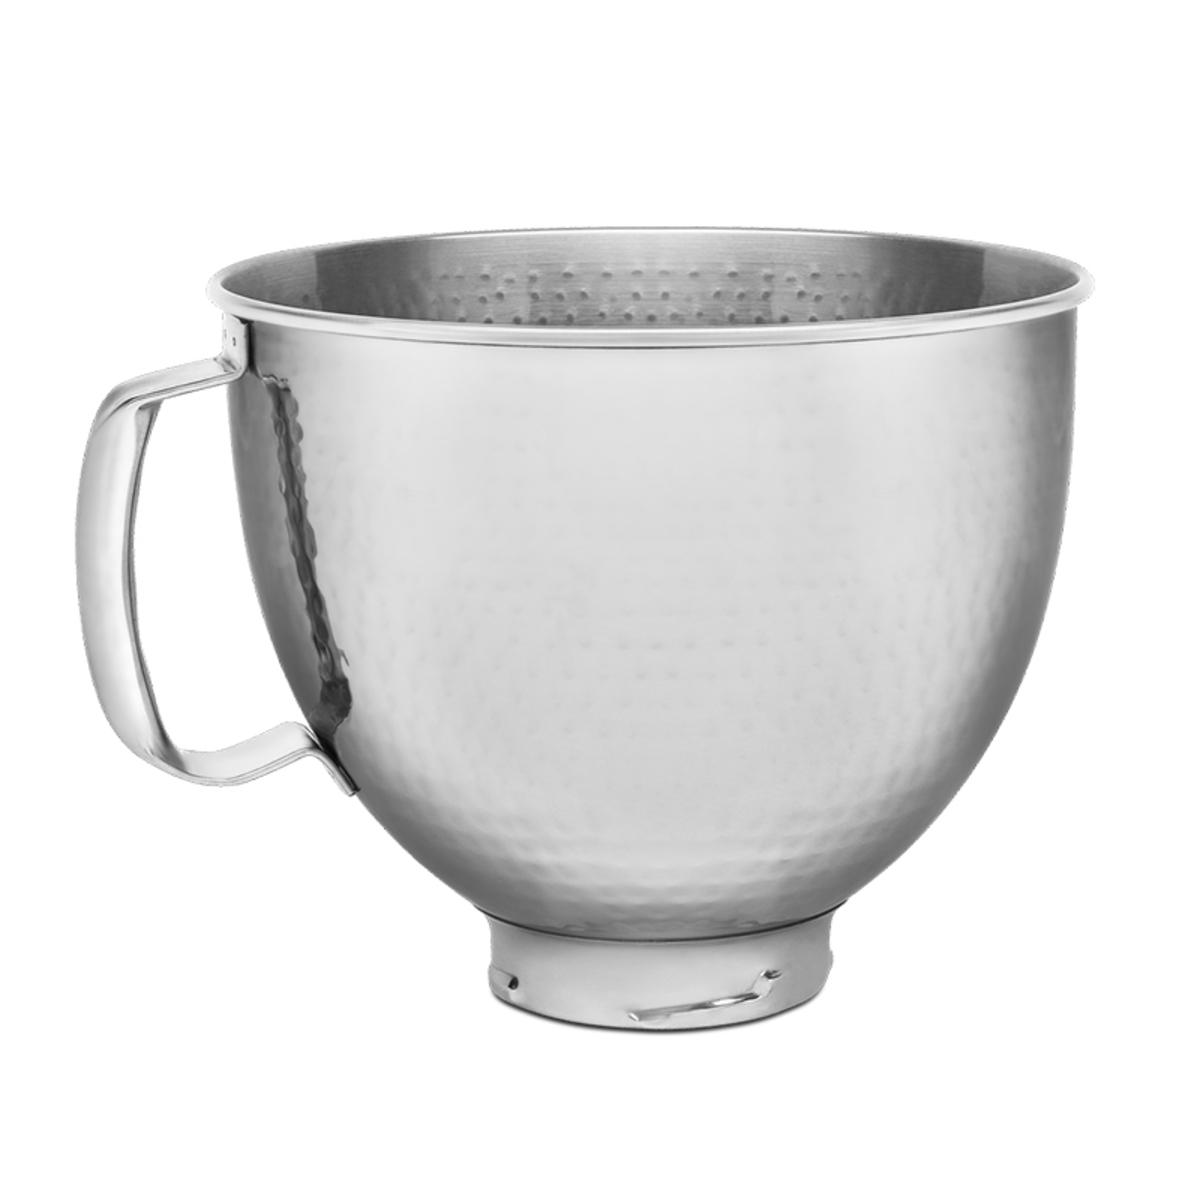 KitchenAid 5KSM5SSBHM 4.7 Litre Bowl, Hammered Stainless Steel